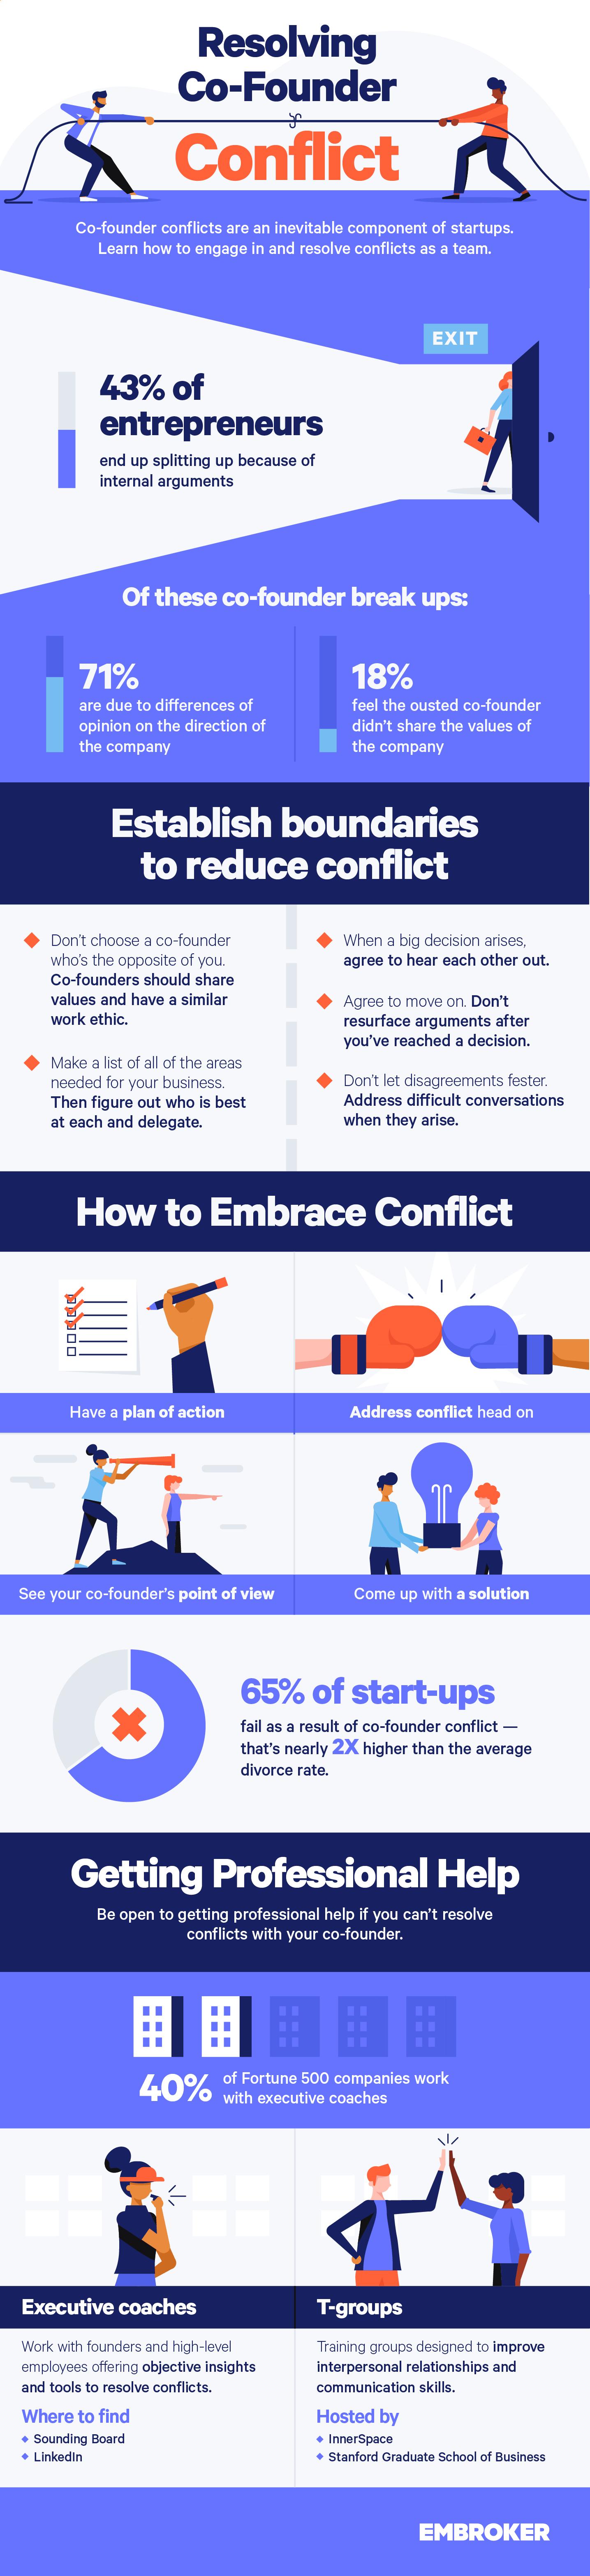 EB Resolving Cofounder Conflict IG